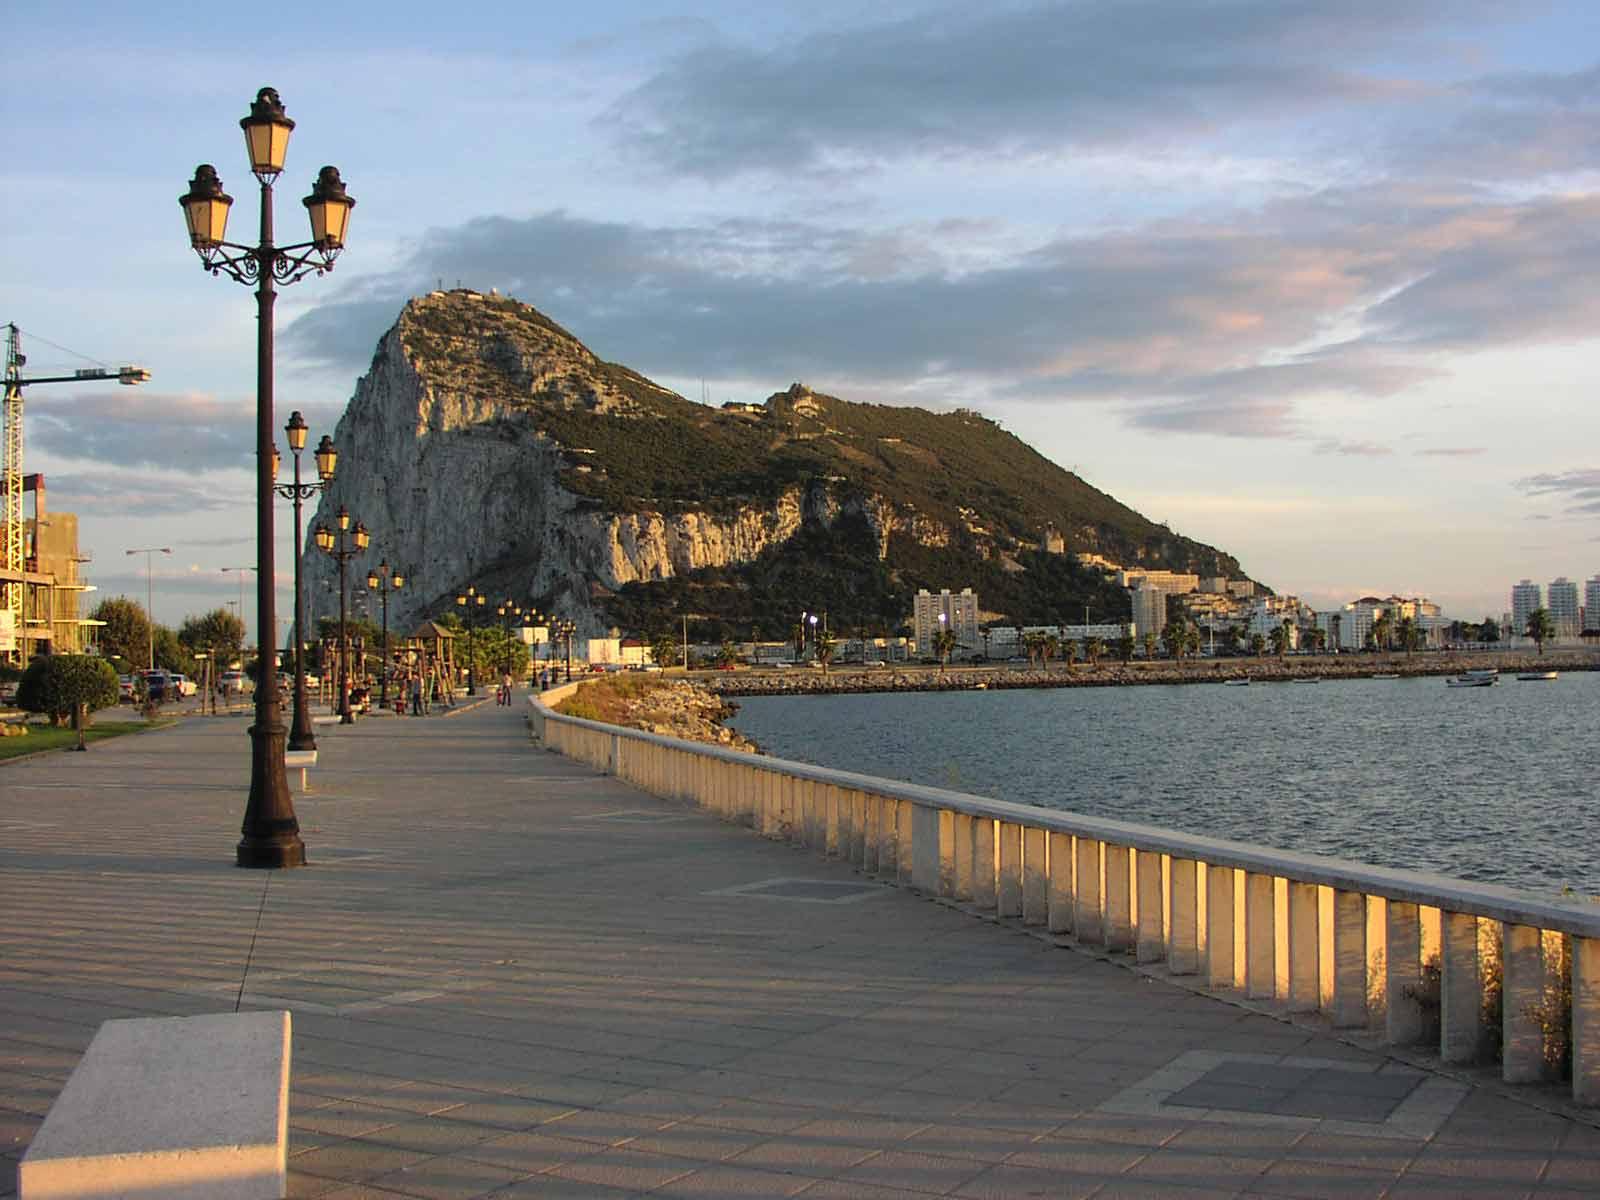 http://2.bp.blogspot.com/_saL7jbvi4GY/TPFSsge4ckI/AAAAAAAABNU/7xNQLU17JZ0/s1600/Enciclop%25C3%25A9dia+Gibraltar+-+Foto+-+%2528www.noholidaynolife.com%2529.jpg